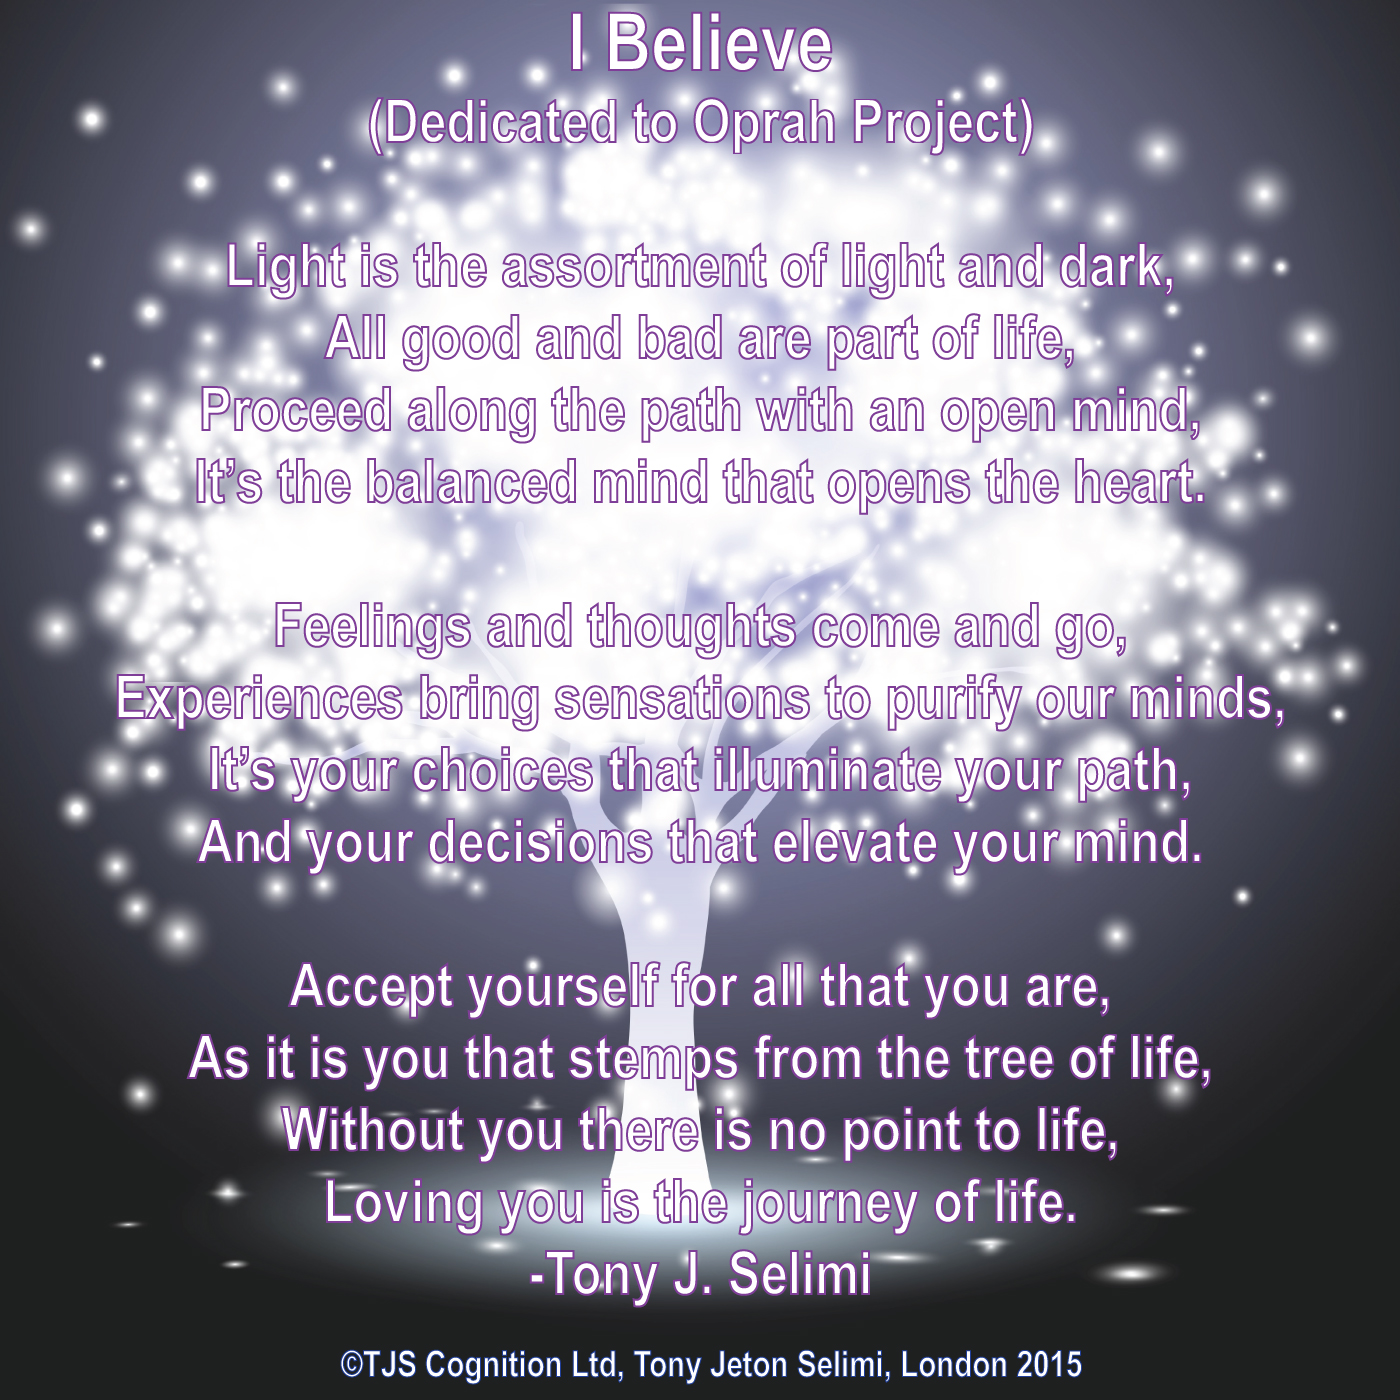 I-Believe-for-Oprah-Project-by-Tony-J-Selimi